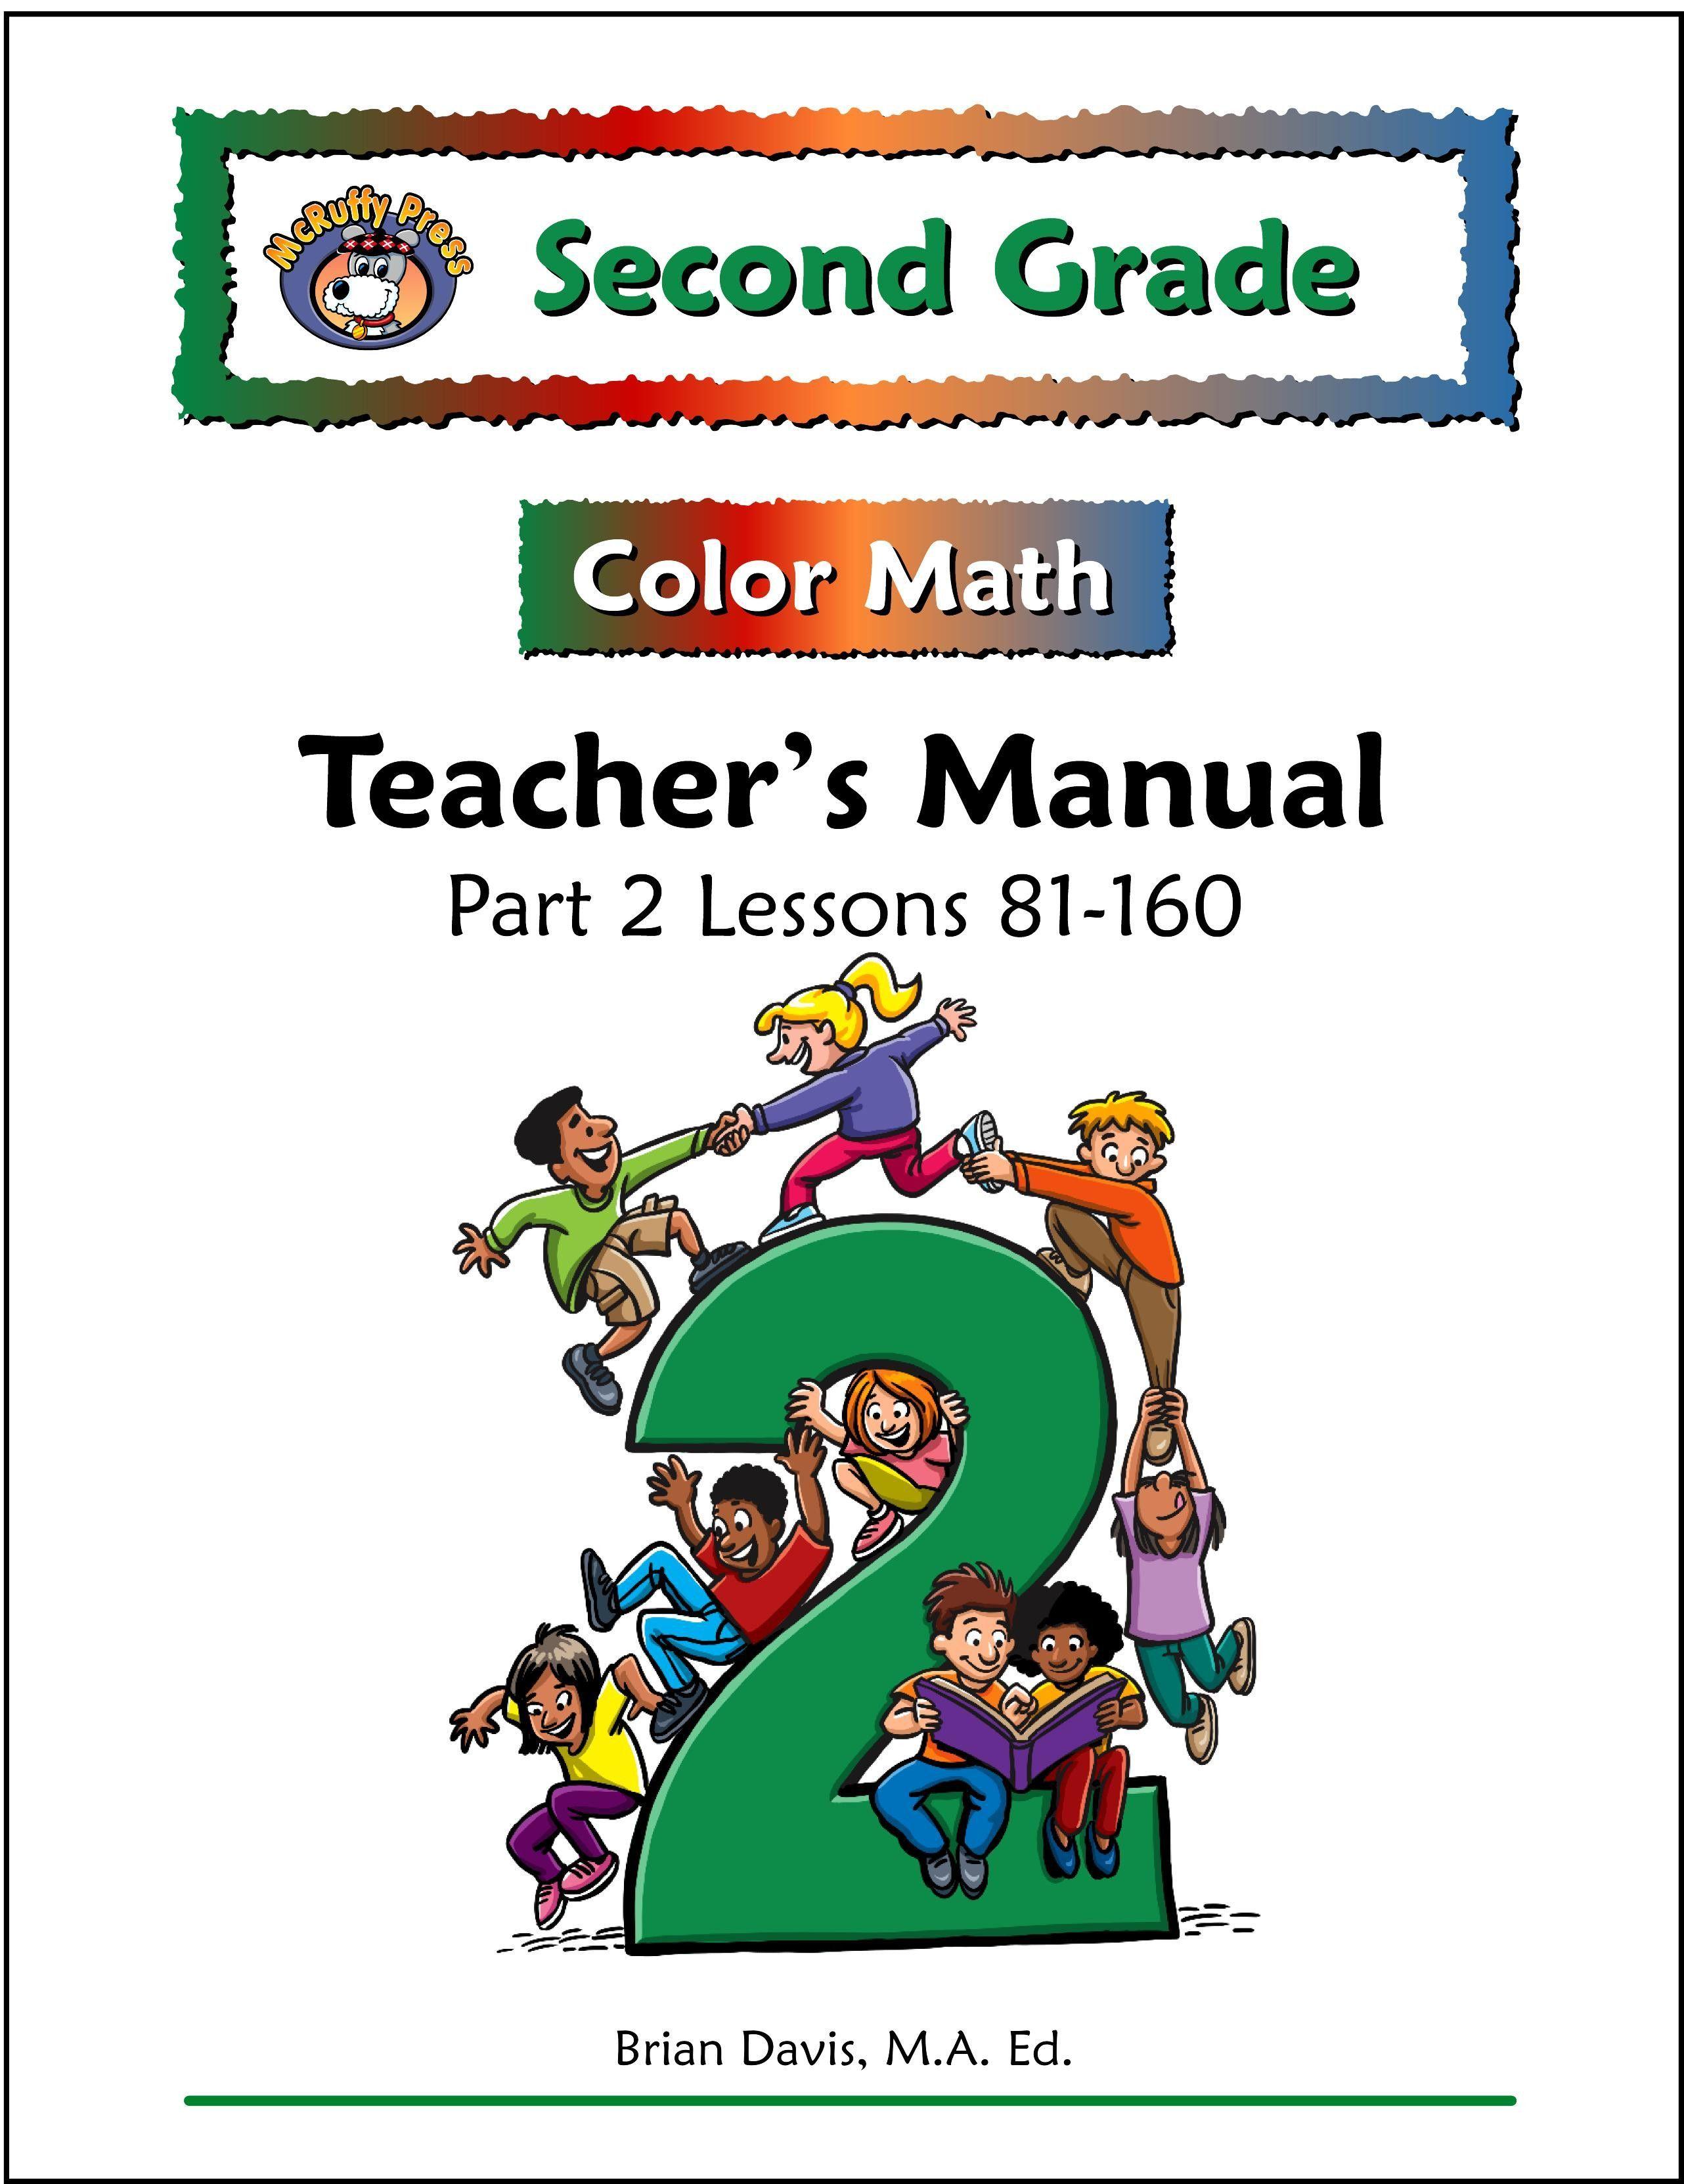 Second Grade Color Math Teacher\'s Manual Part 2 | Products